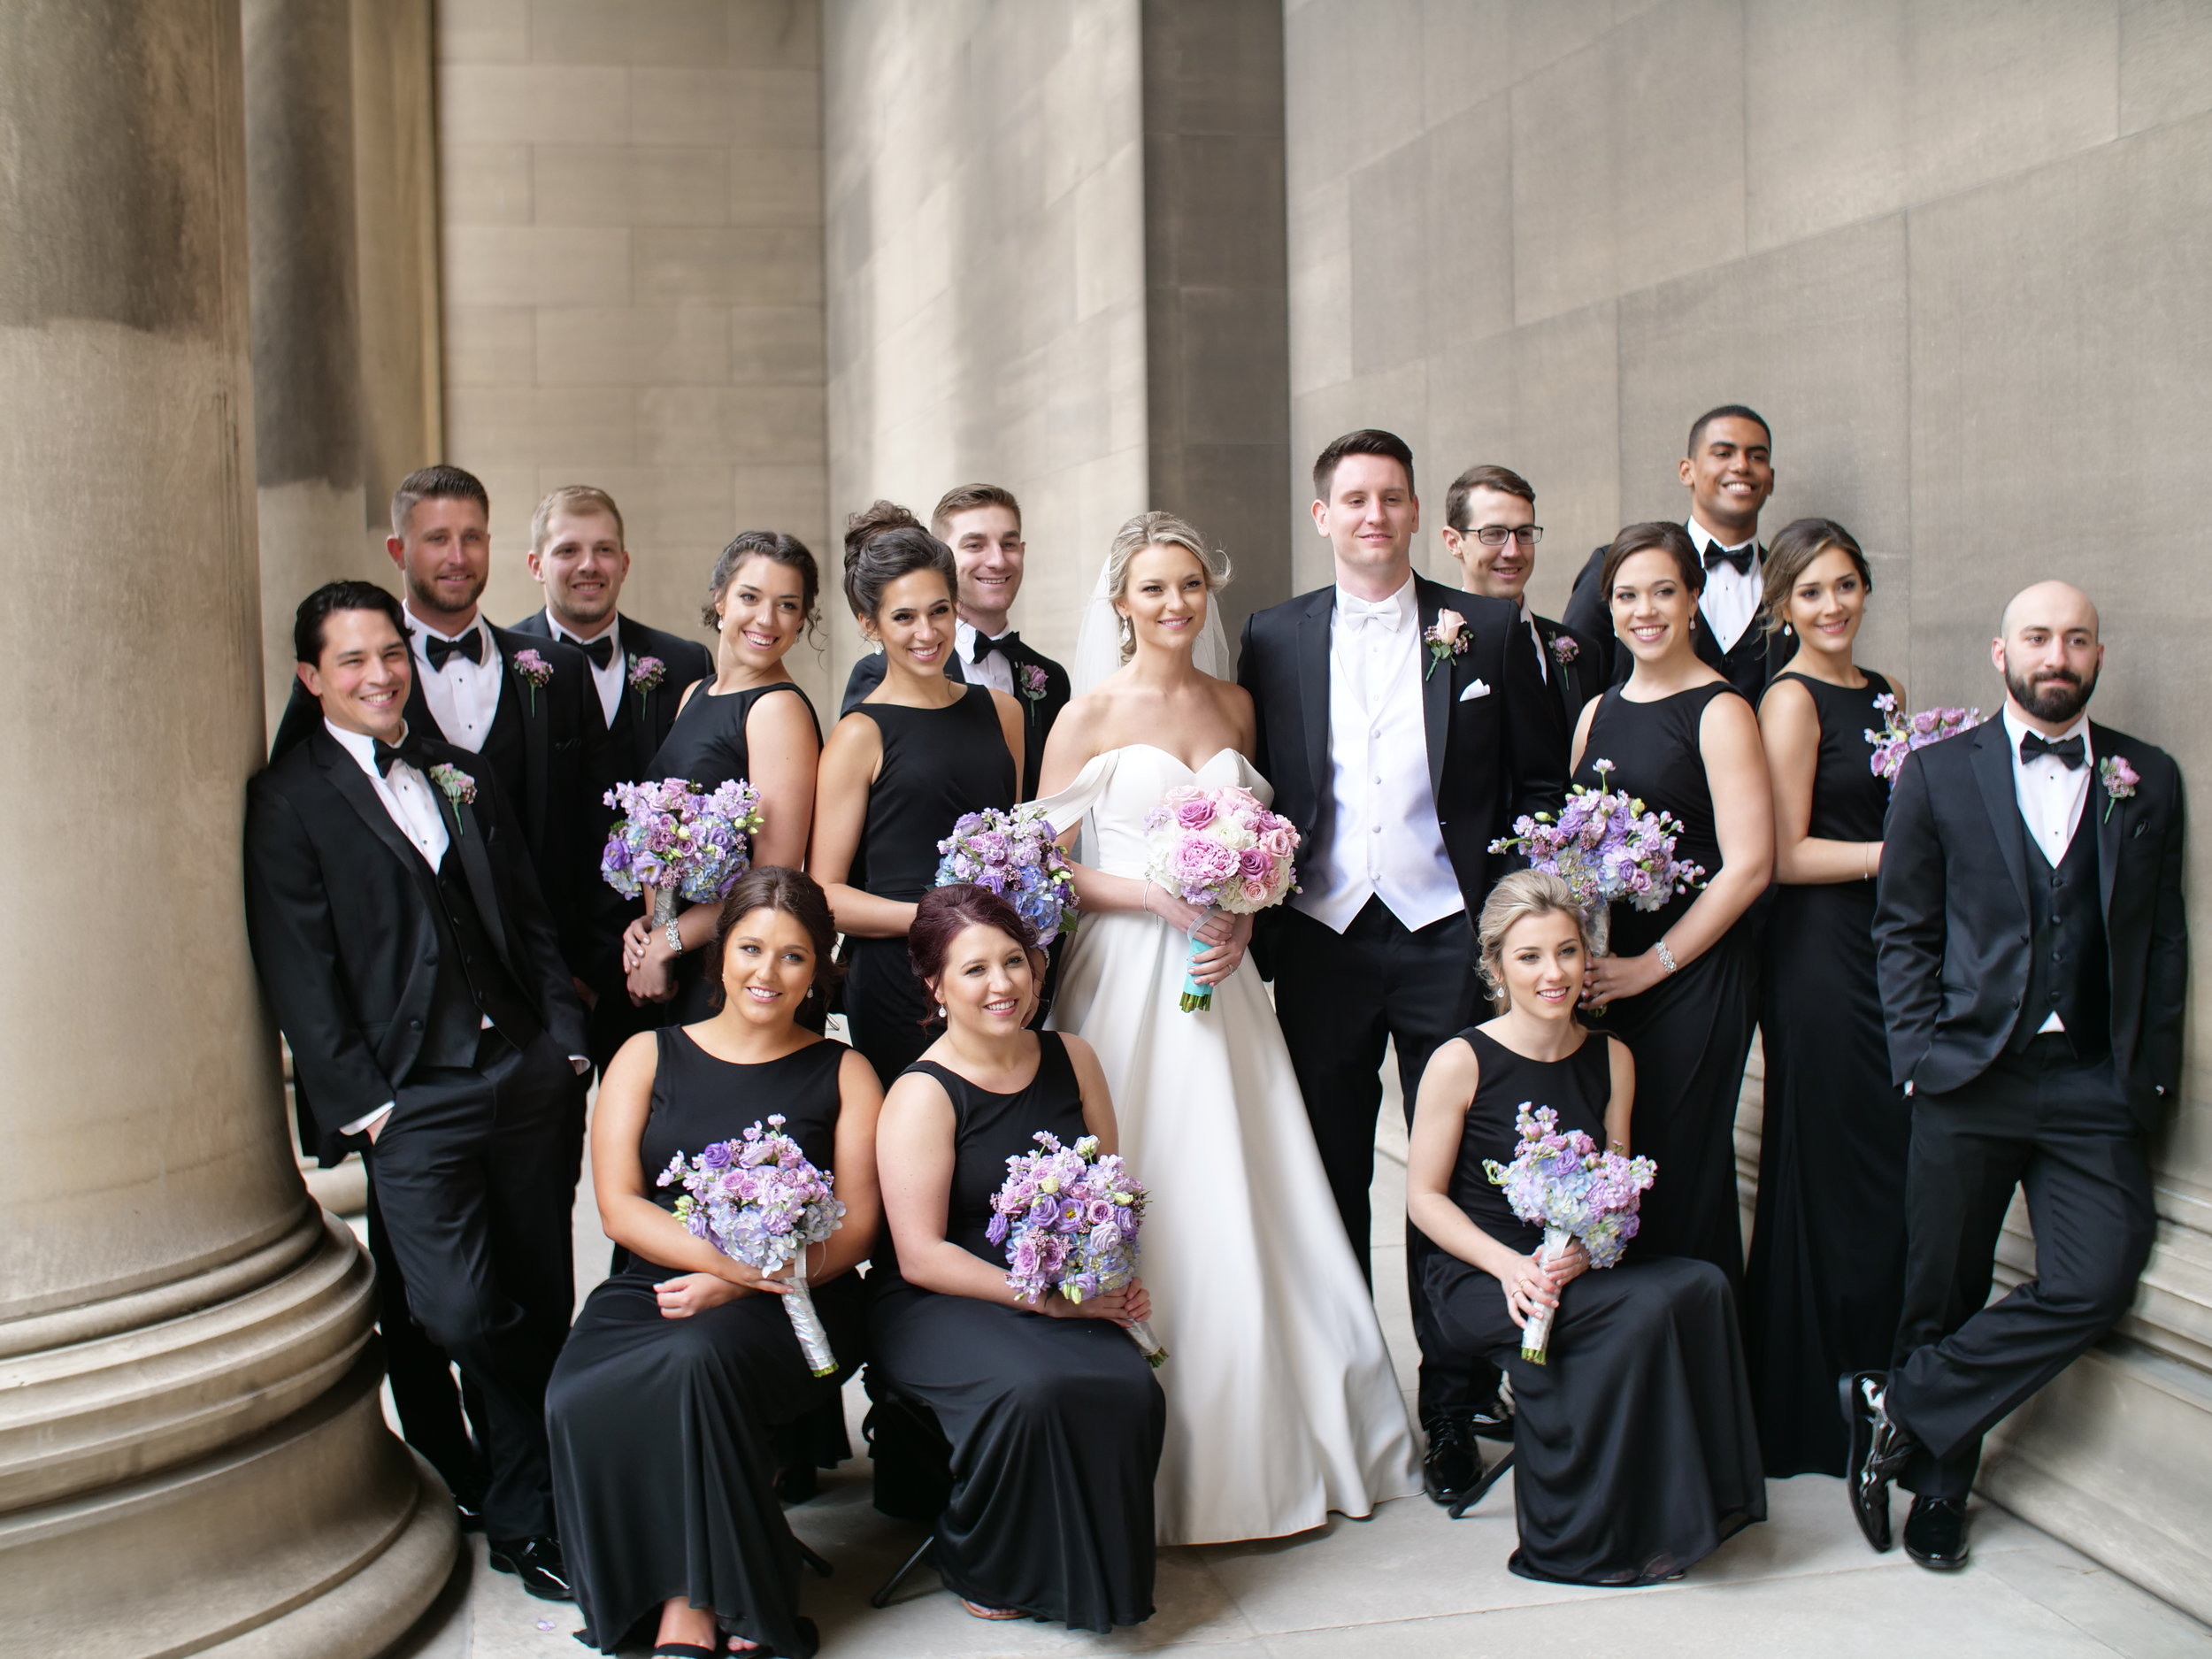 Pittsburgh Wedding photo location ideas